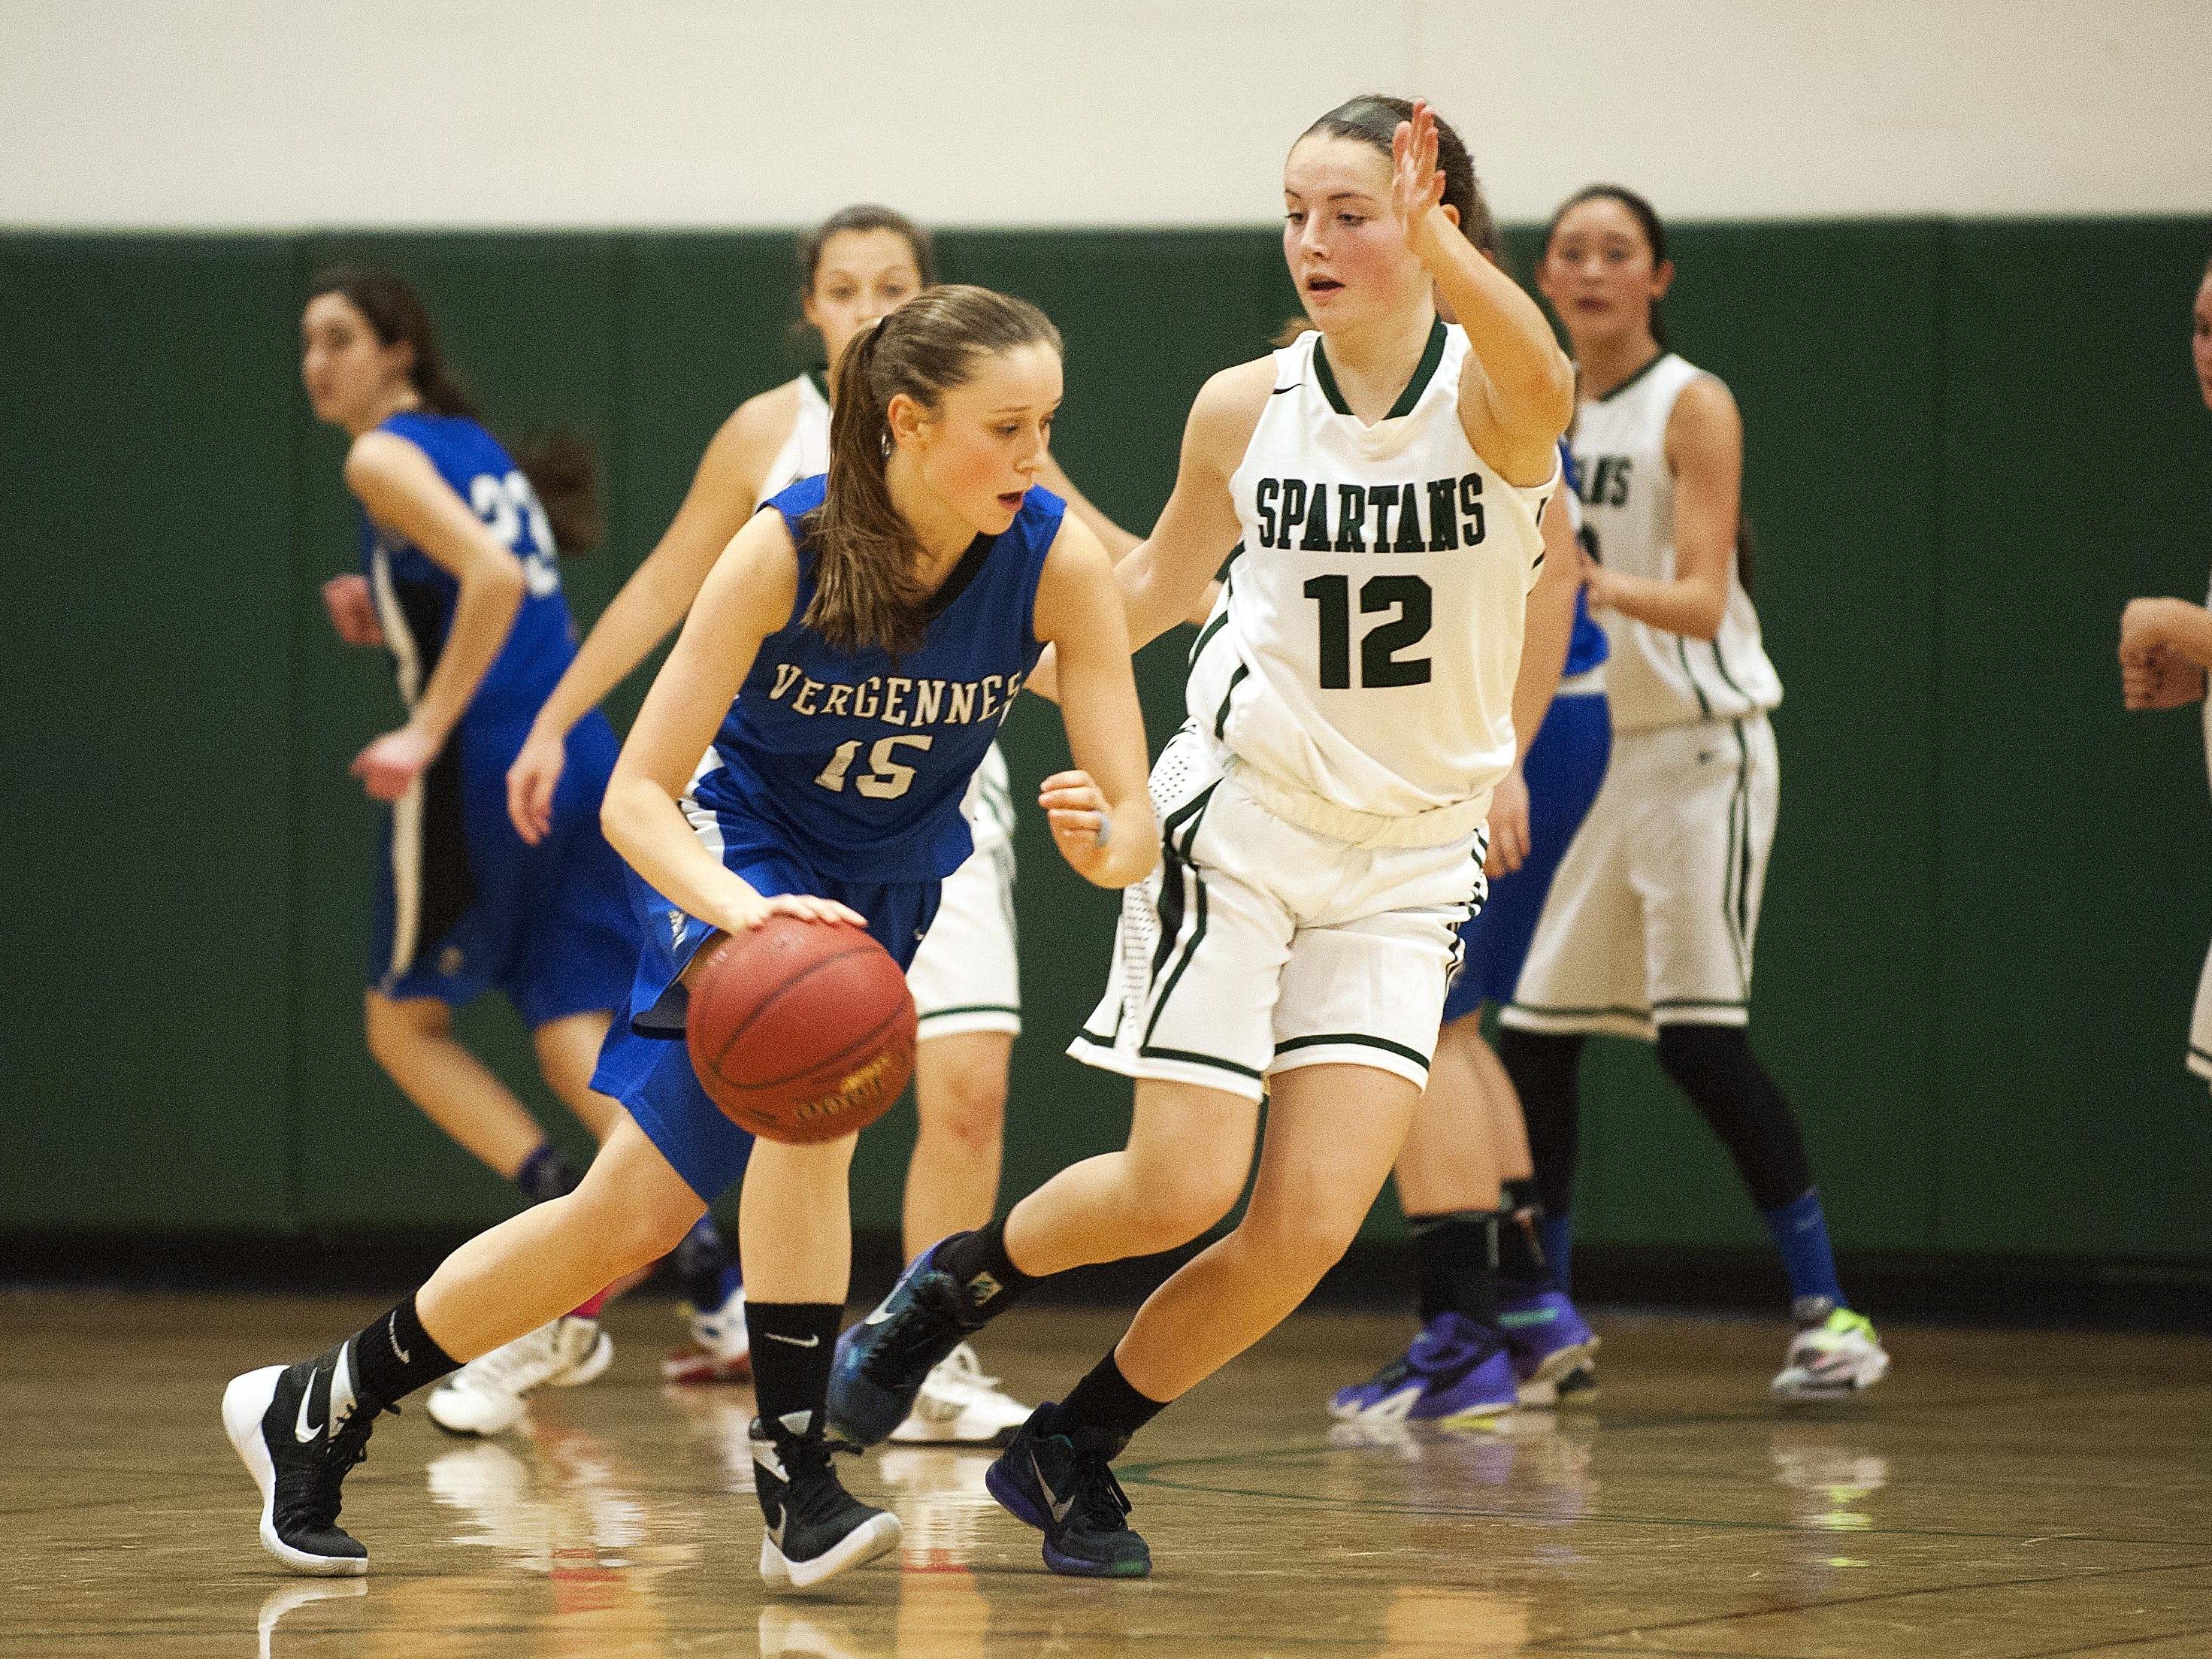 Vergennes' Caroline Johnston (15) dribbles the ball around Winooski's Lydia Nattress (12) during the girls basketball game at Winooski High School on Wednesday.